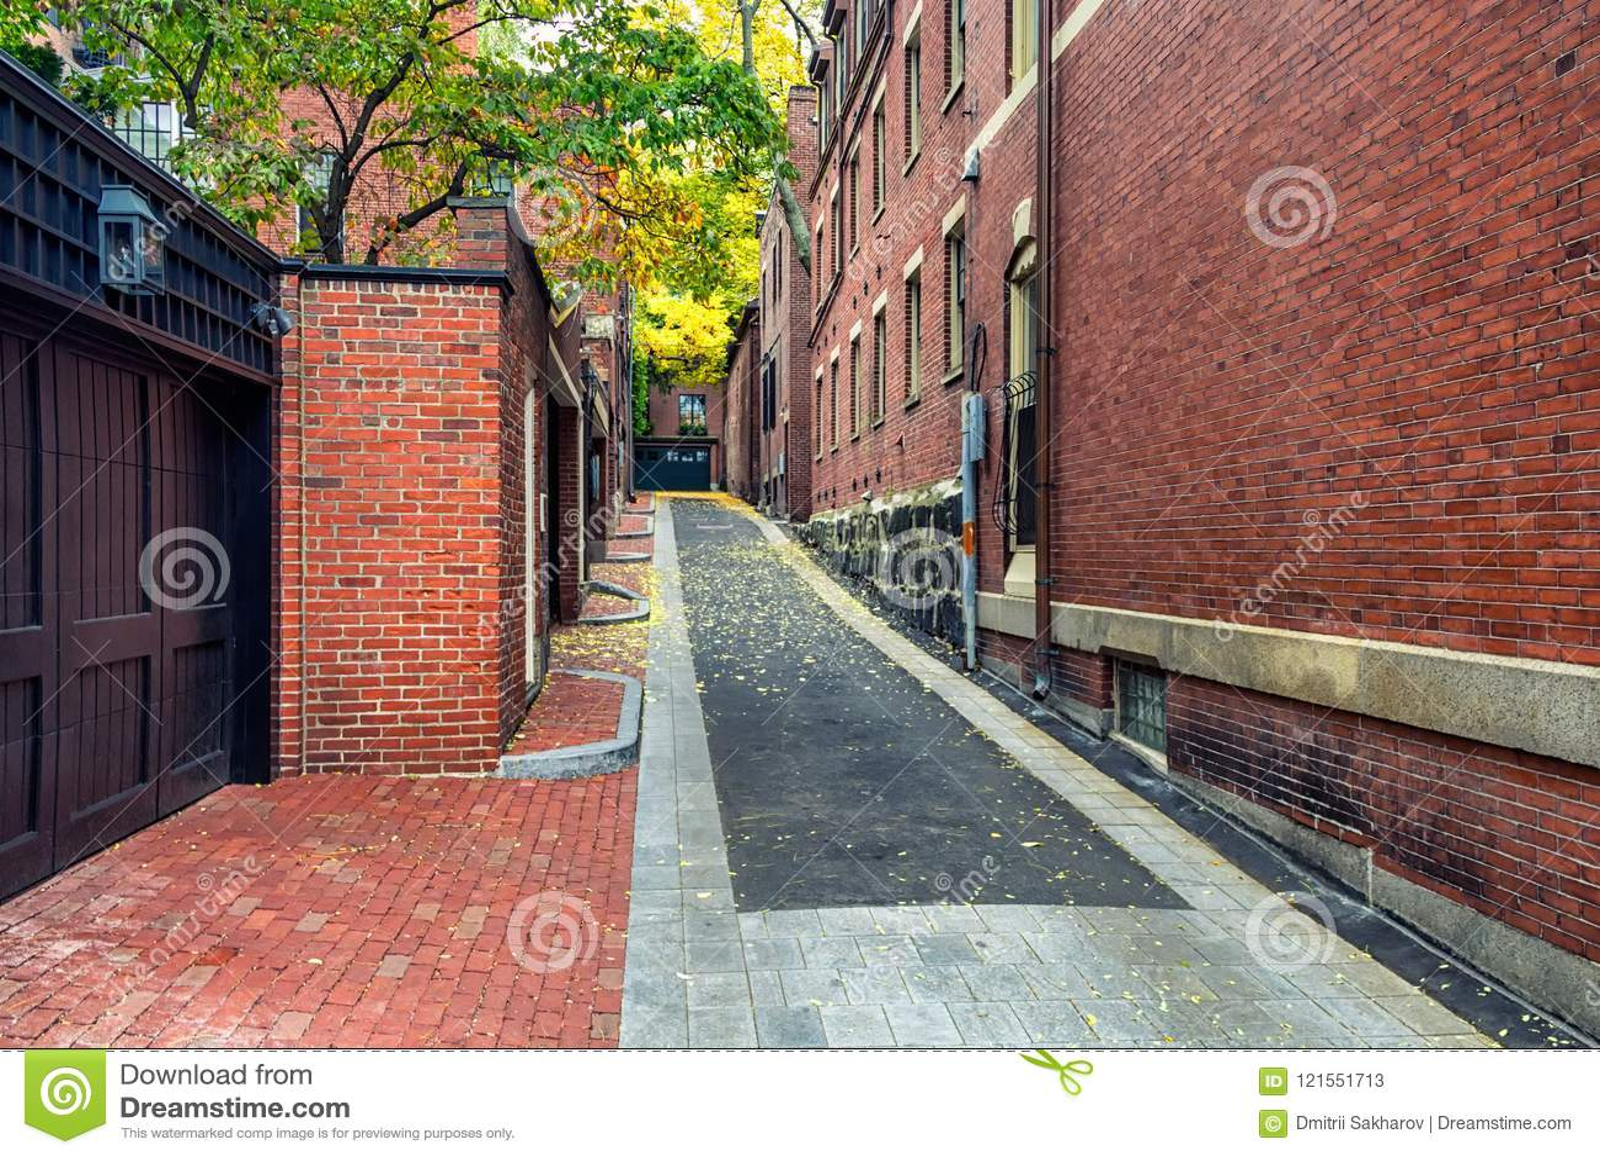 Red brick buildings in Boston`s Beacon hill district in fall season